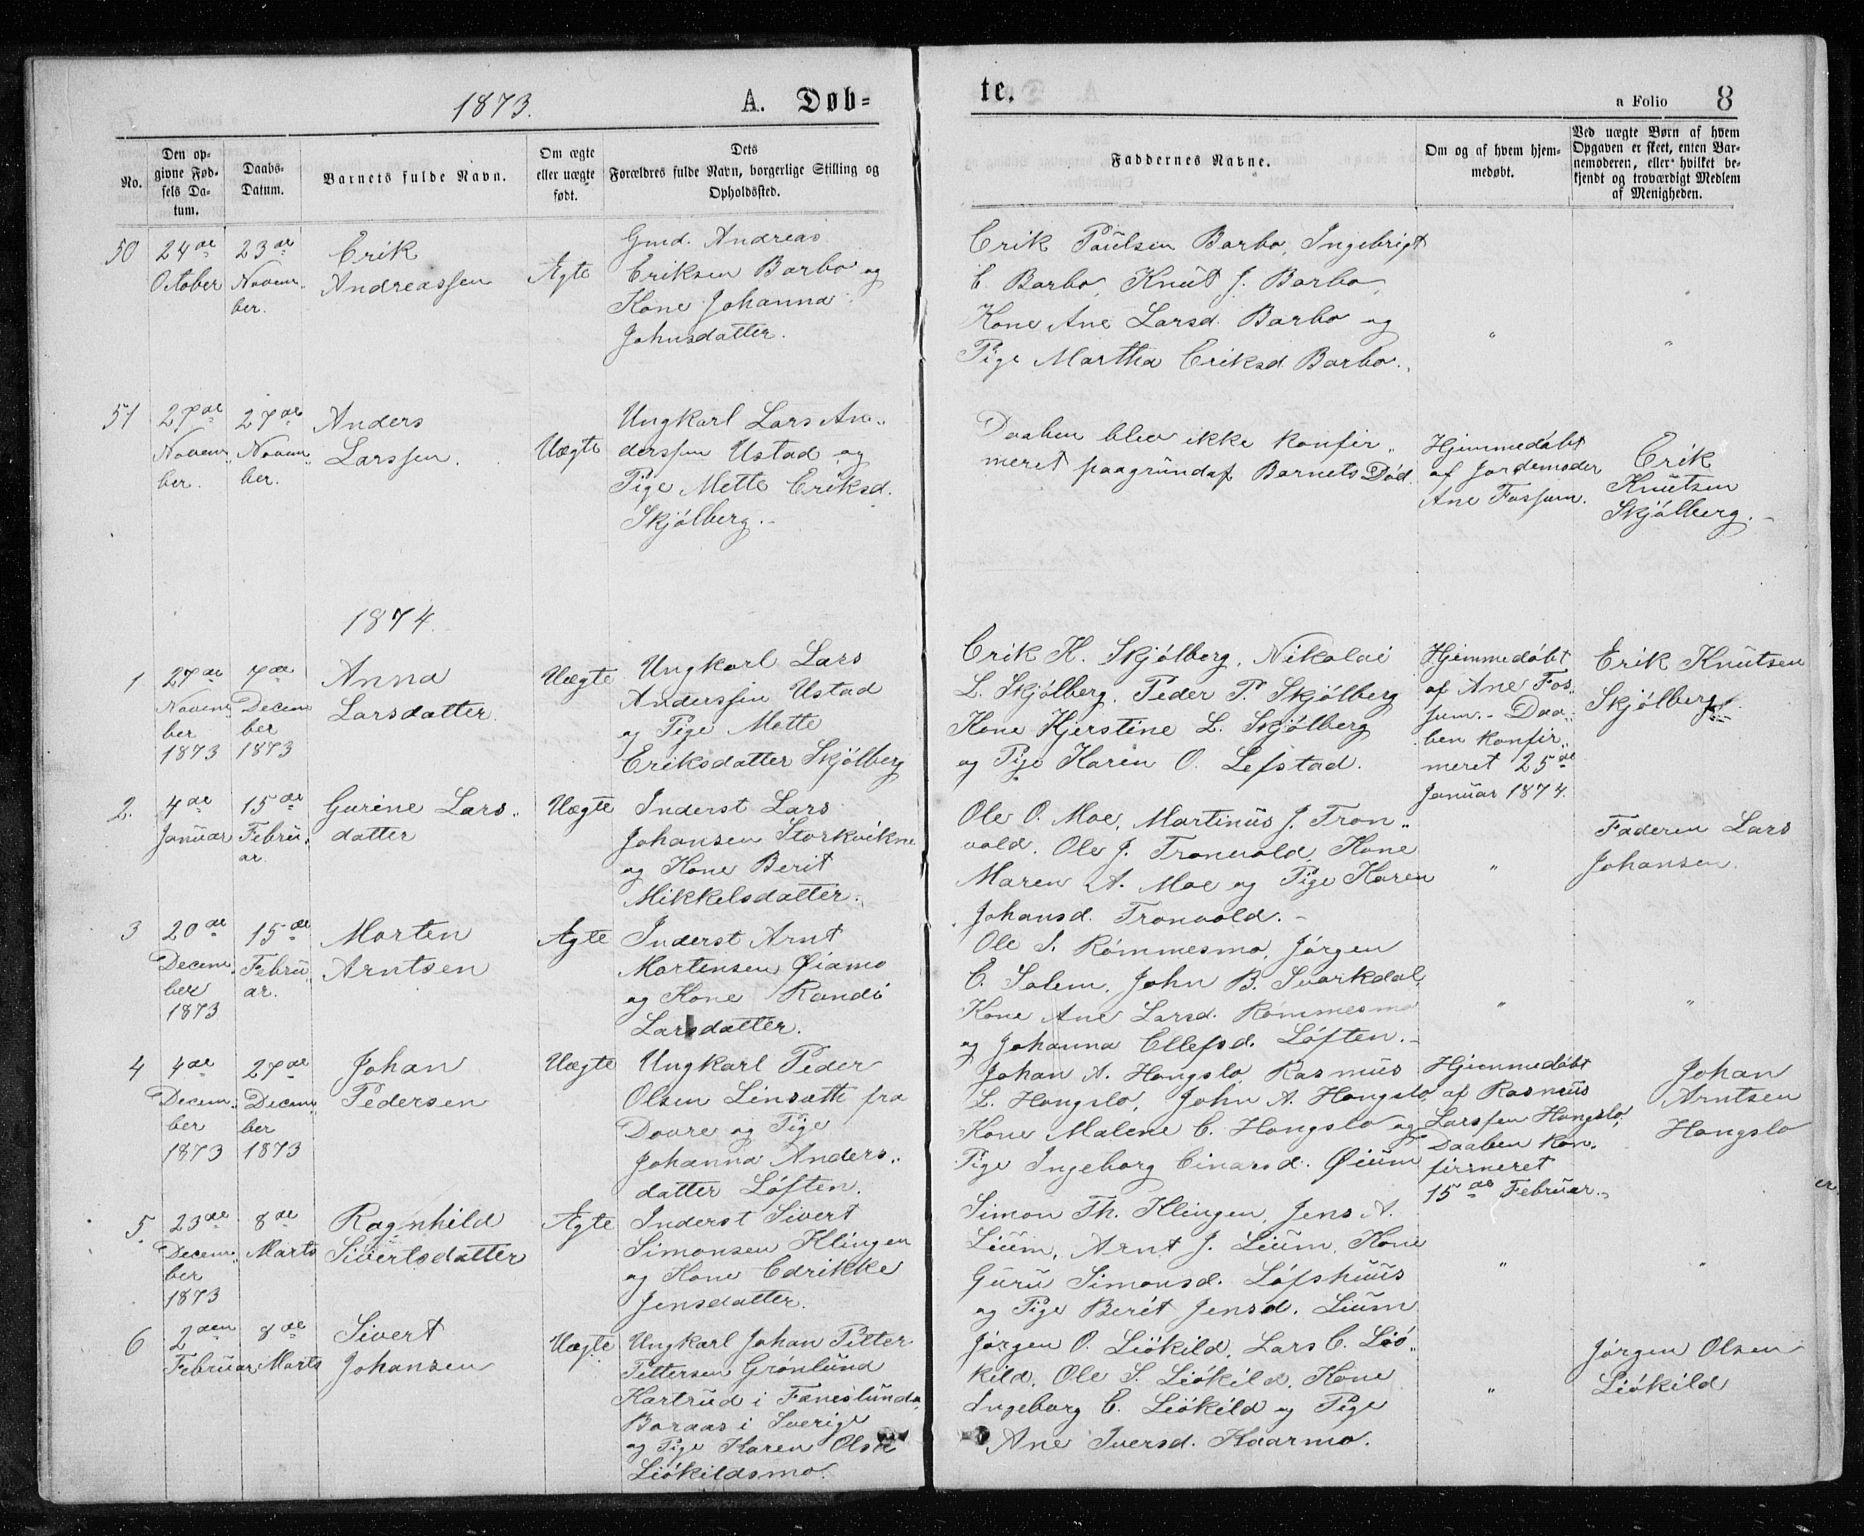 SAT, Ministerialprotokoller, klokkerbøker og fødselsregistre - Sør-Trøndelag, 671/L0843: Parish register (copy) no. 671C02, 1873-1892, p. 8